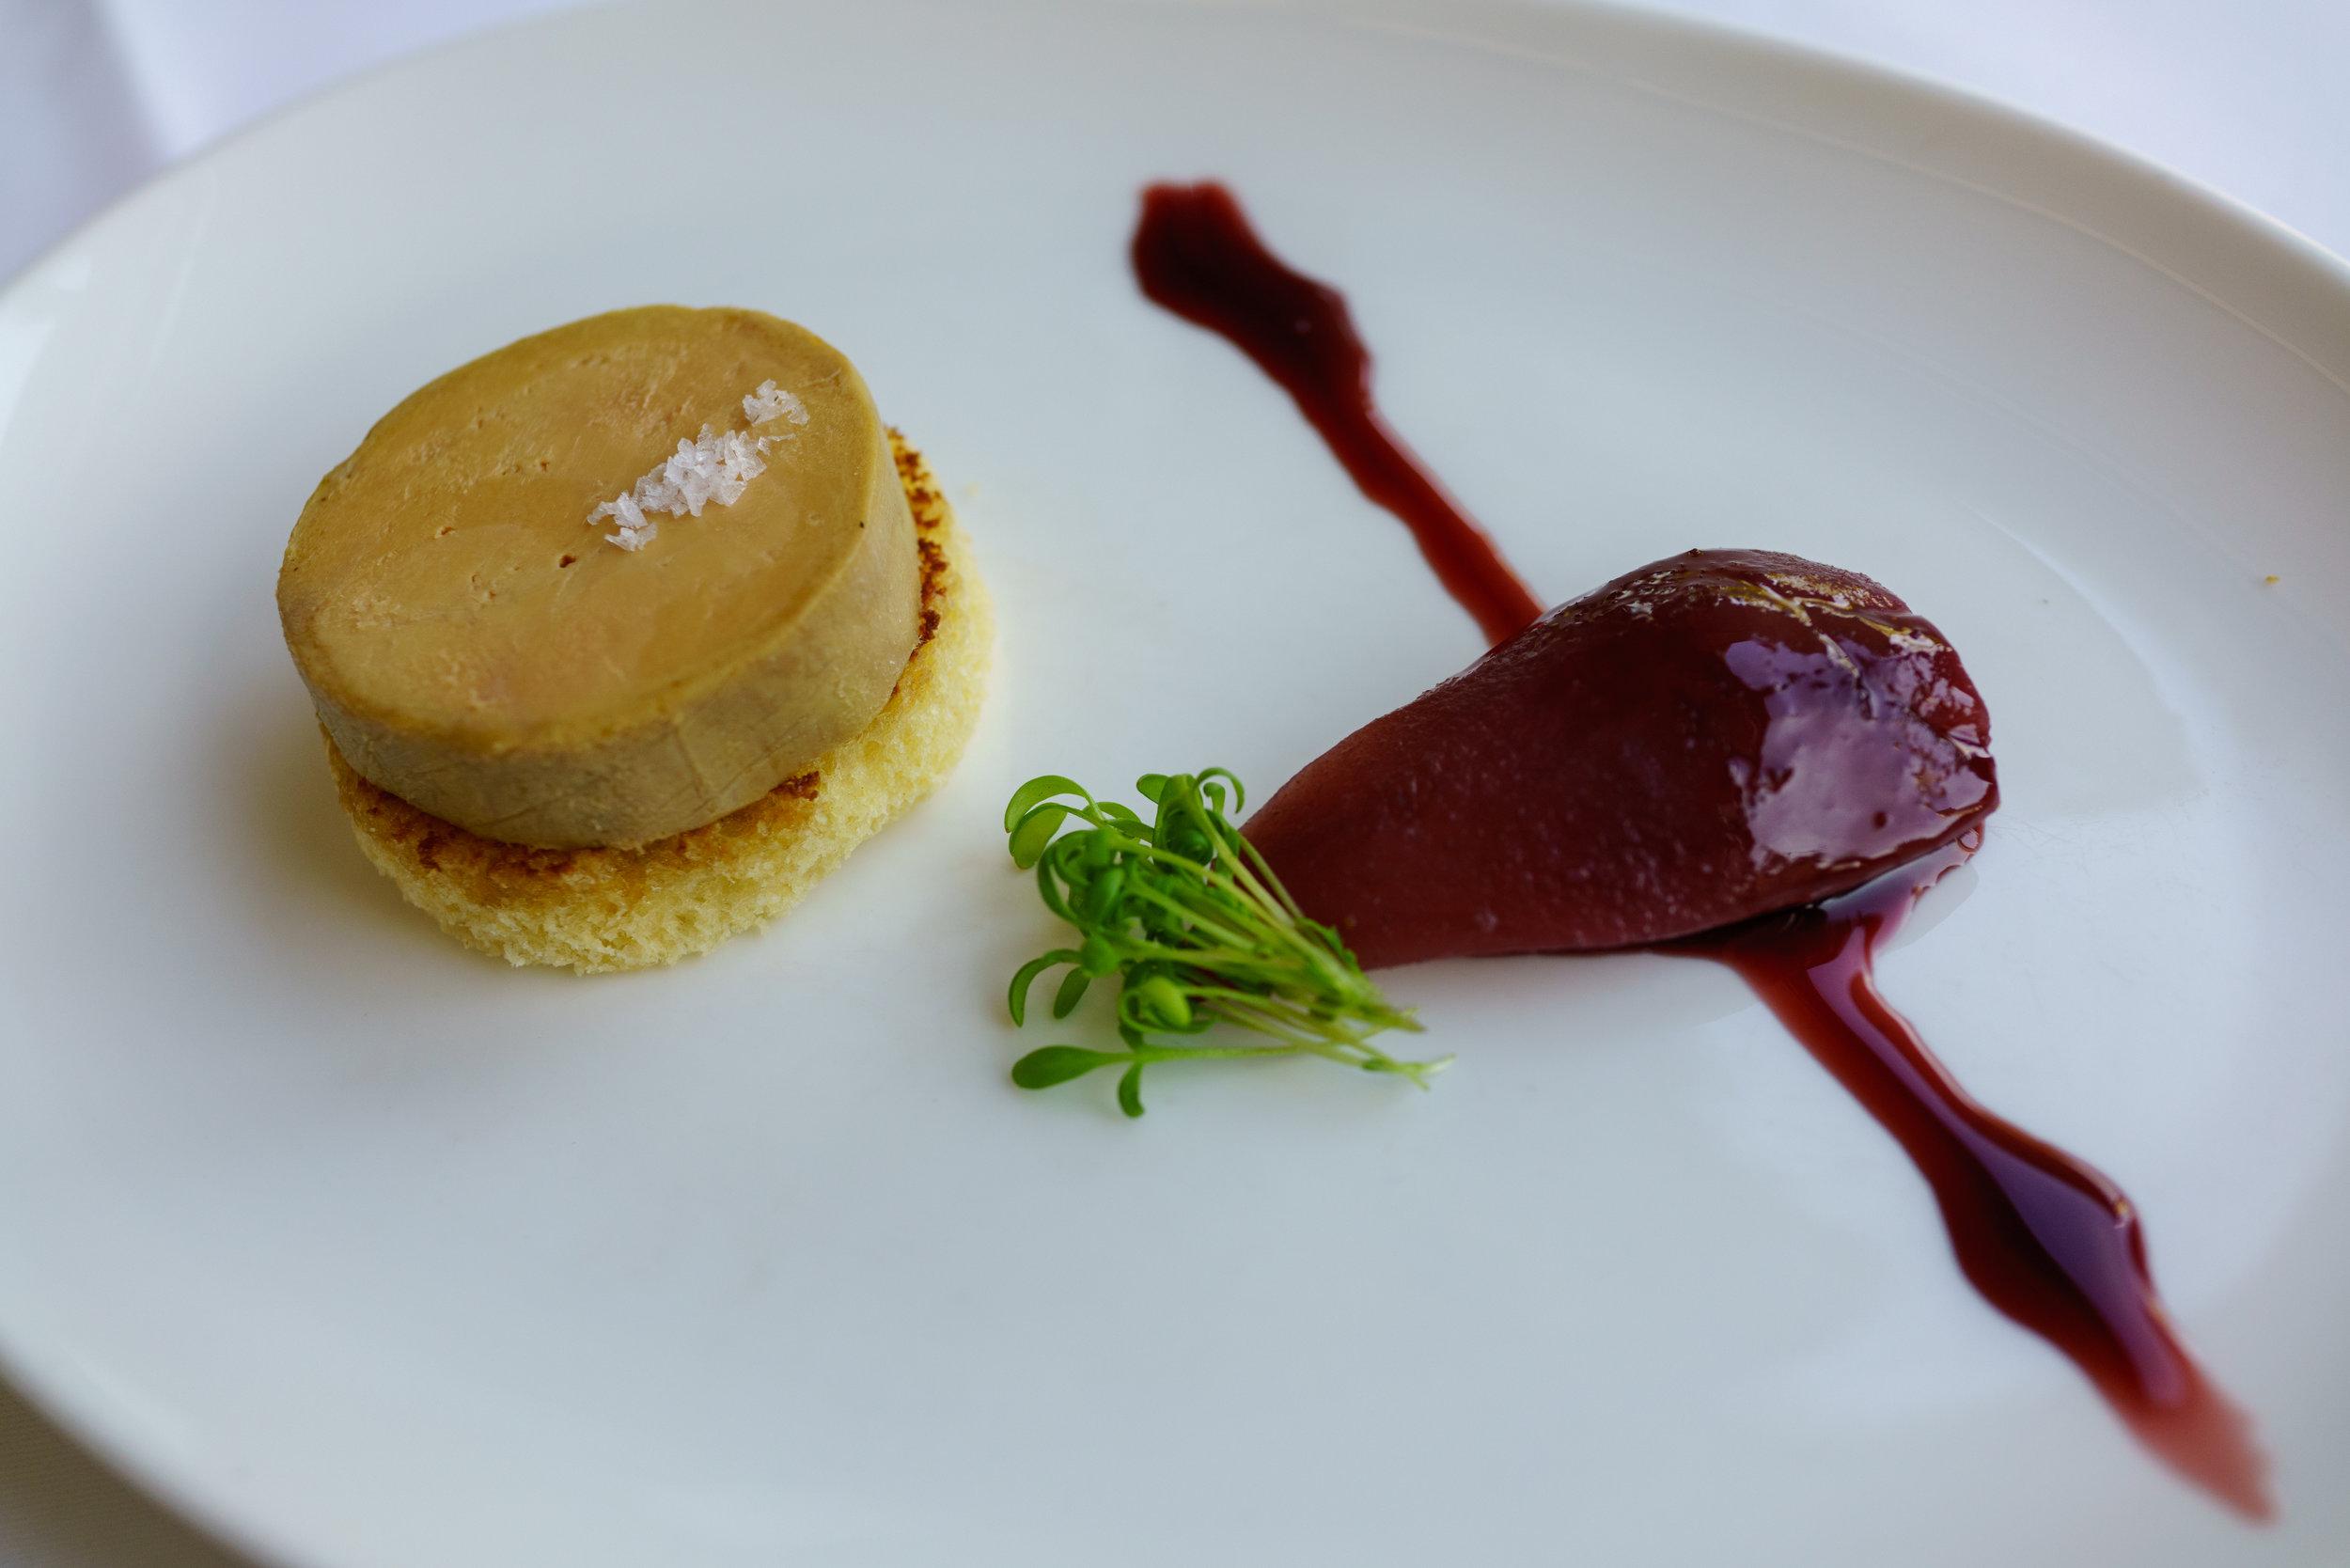 Foie gras torchon, Croatian red wine reduction, pear, and brioche at Bistro Apetit